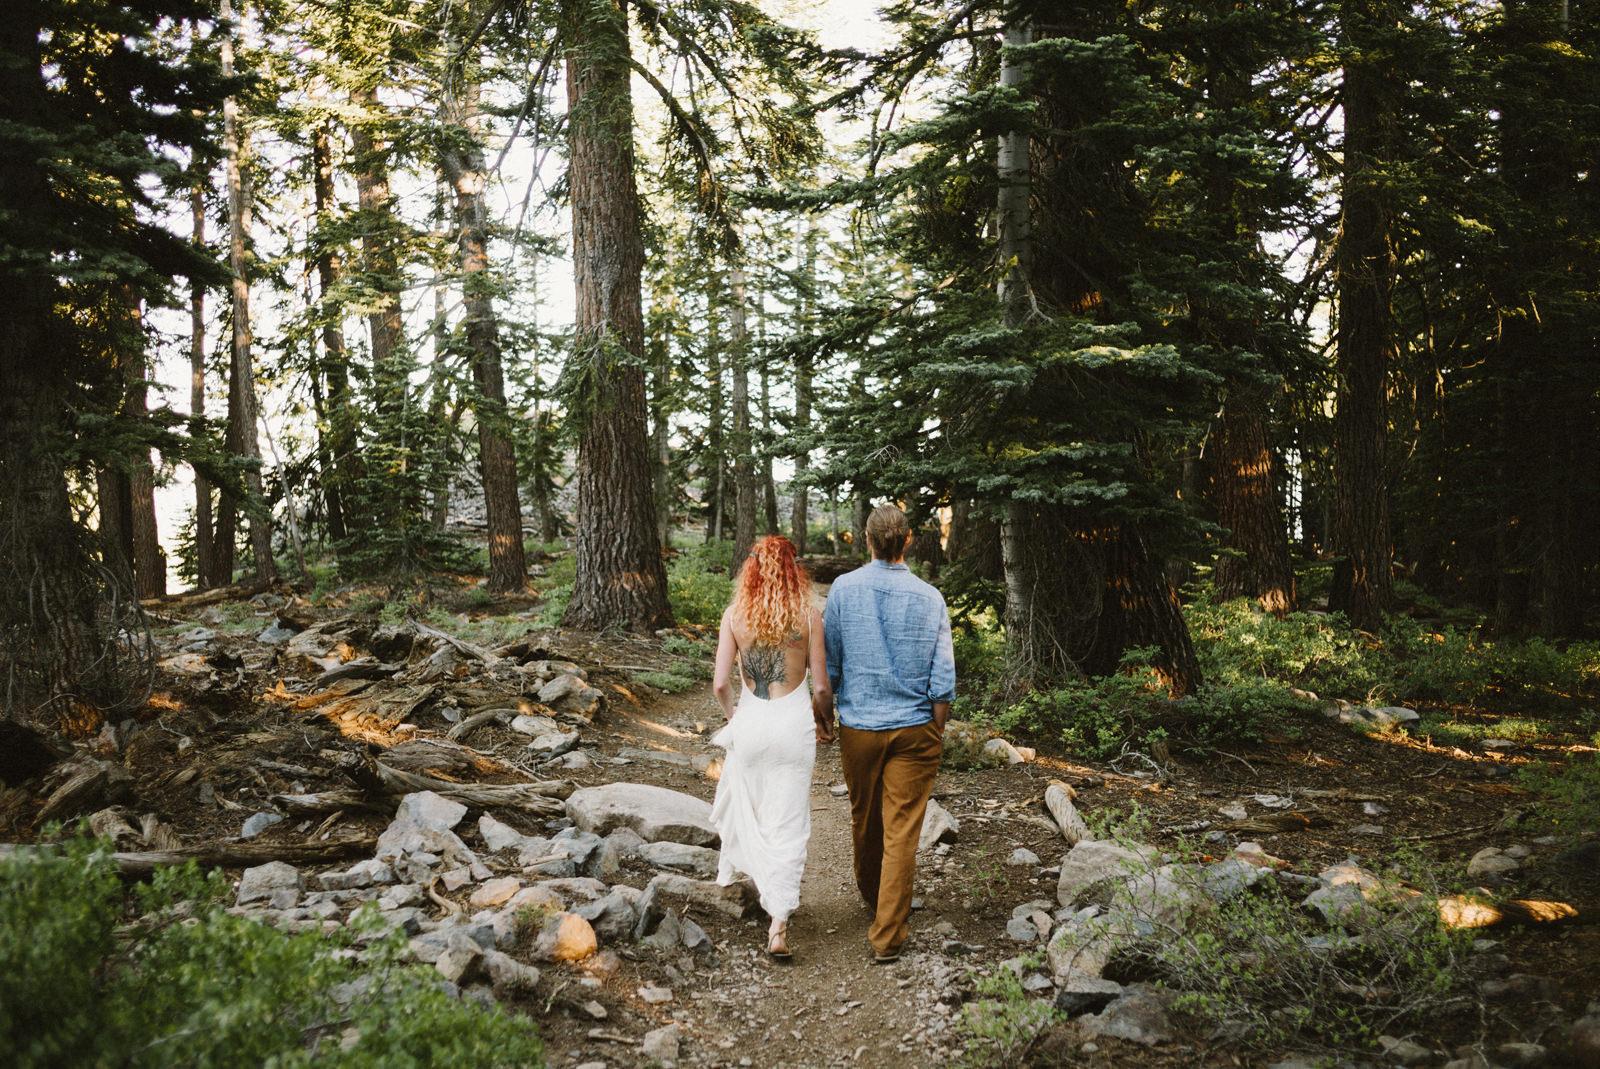 lake-tahoe-elopement-051 LAKE TAHOE ELOPEMENT